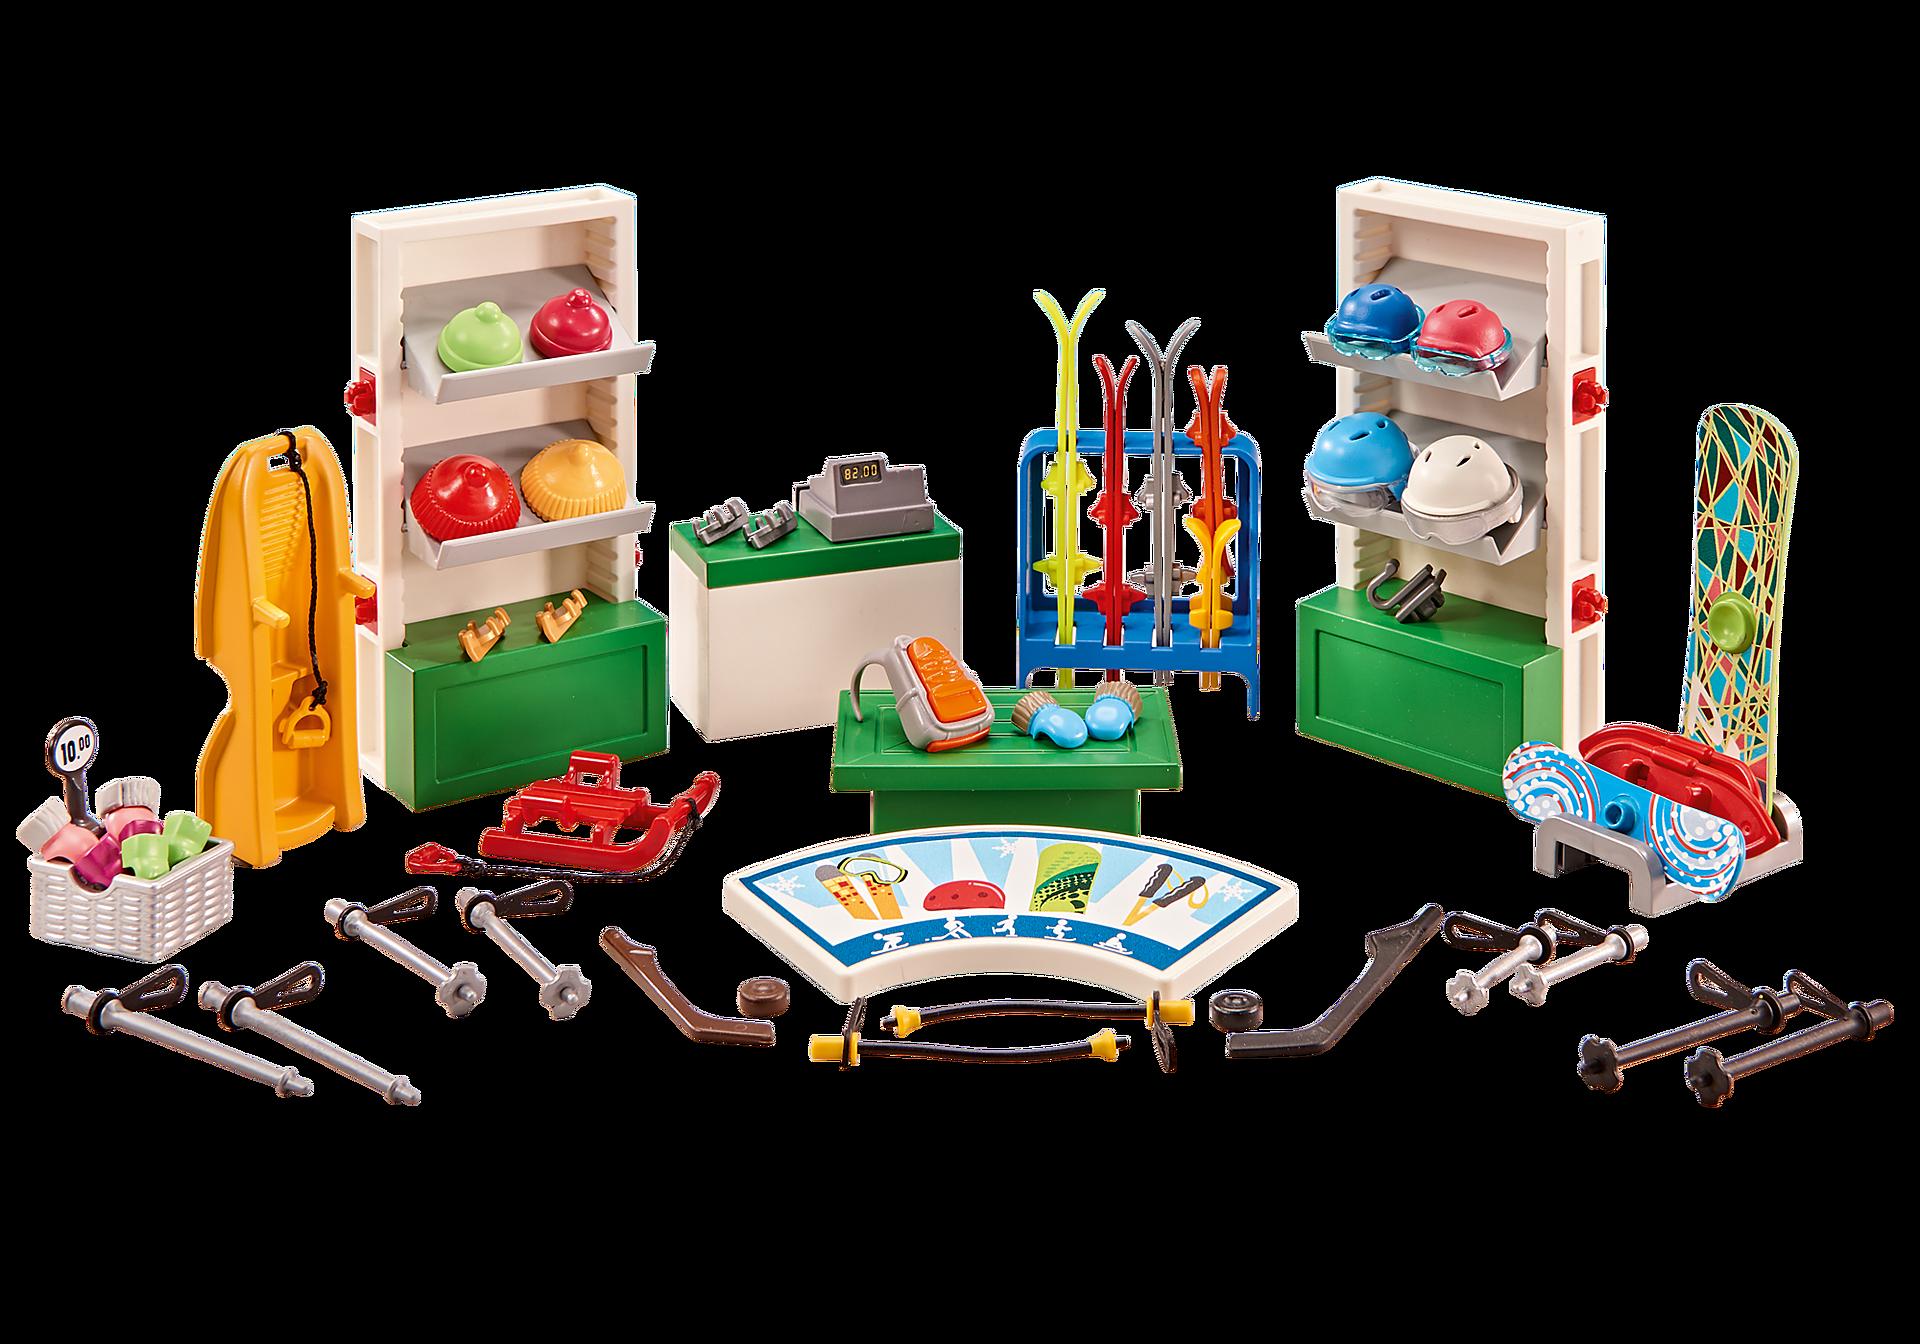 http://media.playmobil.com/i/playmobil/6570_product_detail/Aménagement pour magasin de sports d'hiver